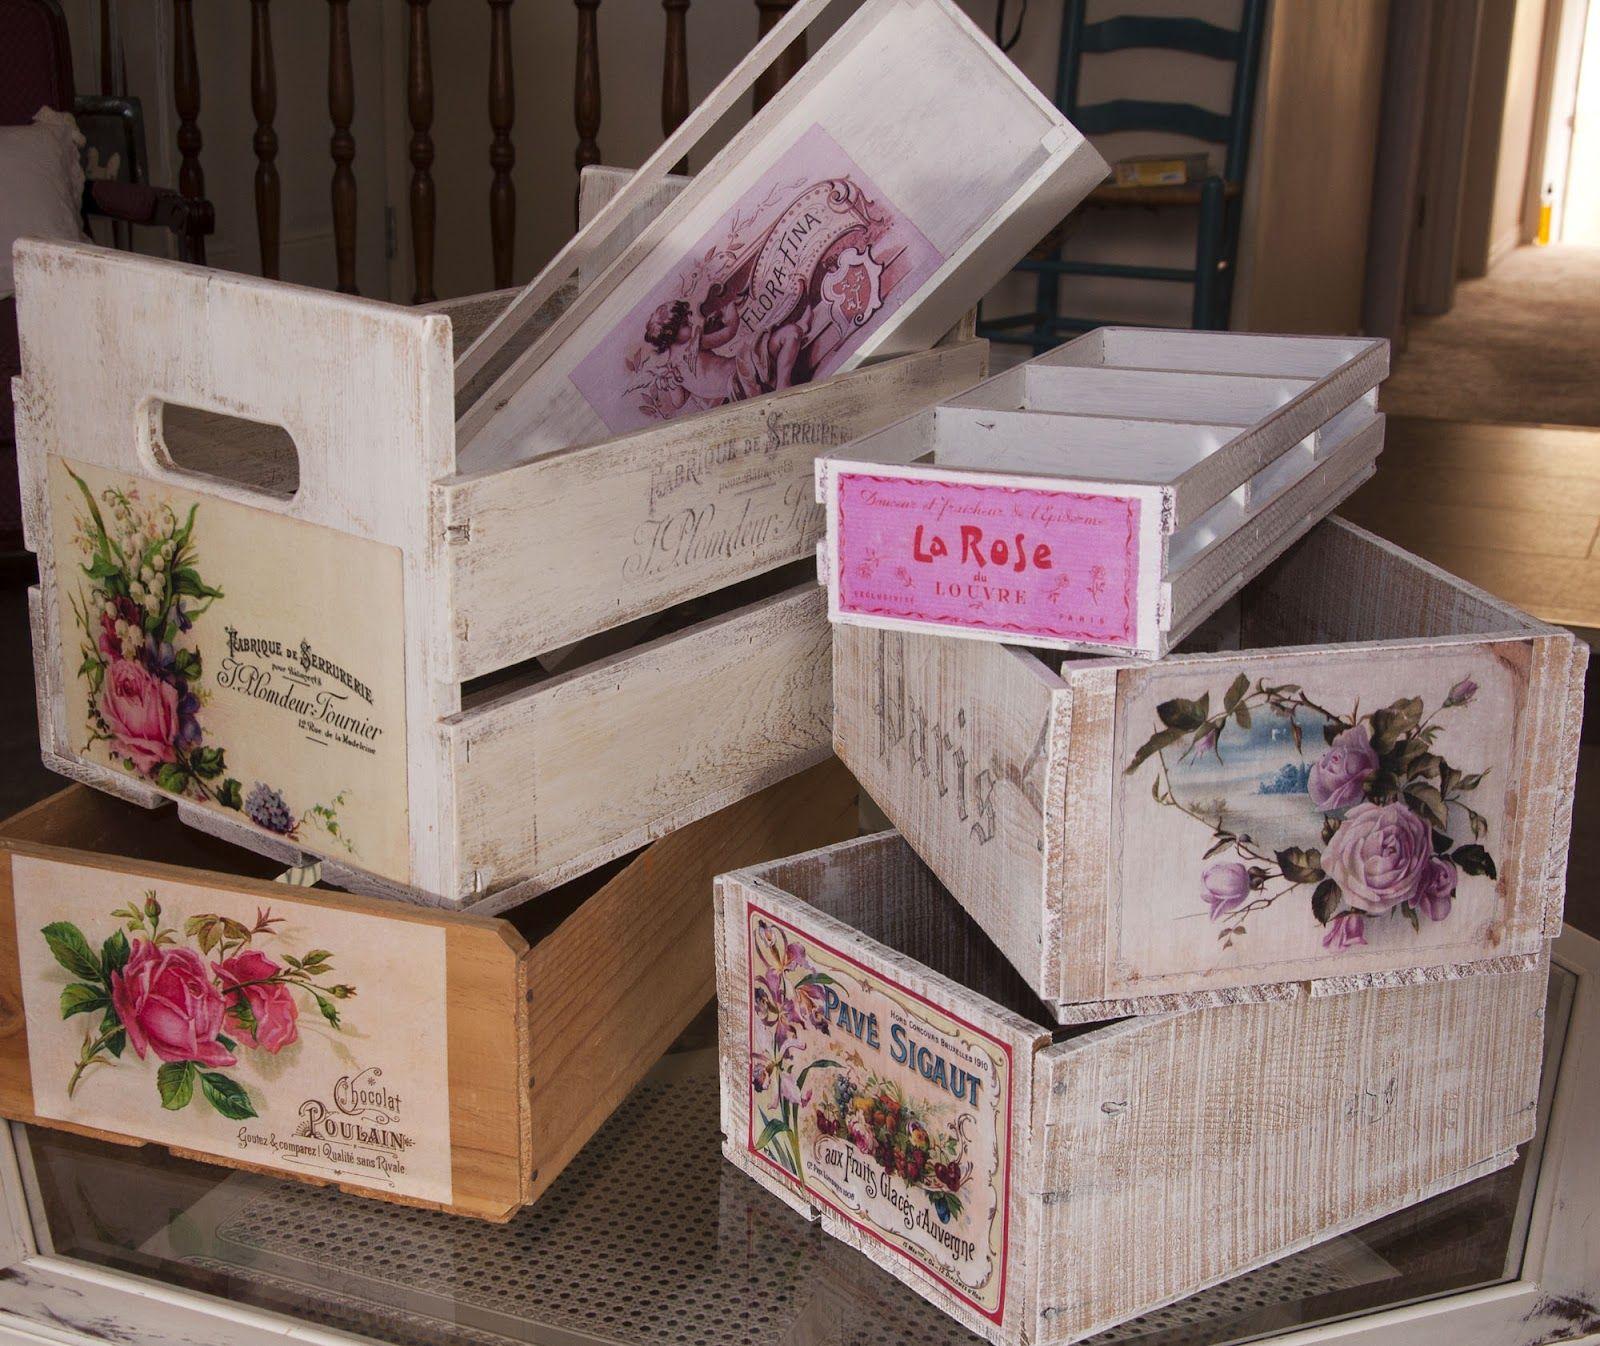 Cajas de fresas cajas cajas de fruta y cajas decoradas - Cajas de fresas decoradas paso a paso ...